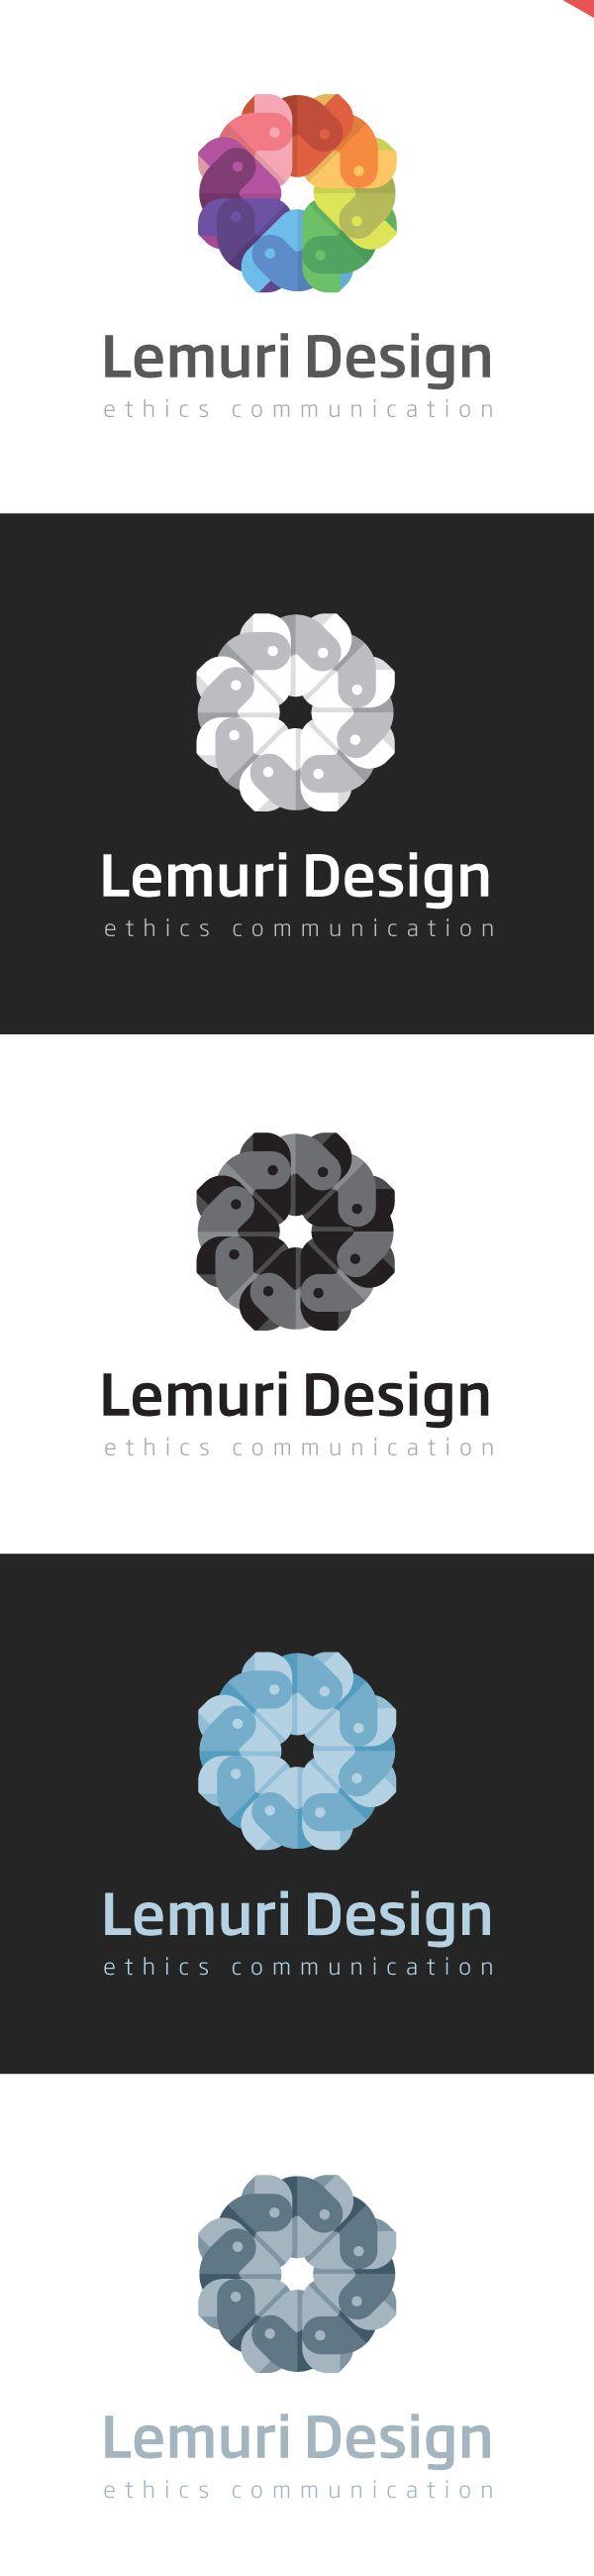 Logo Lemuri Design